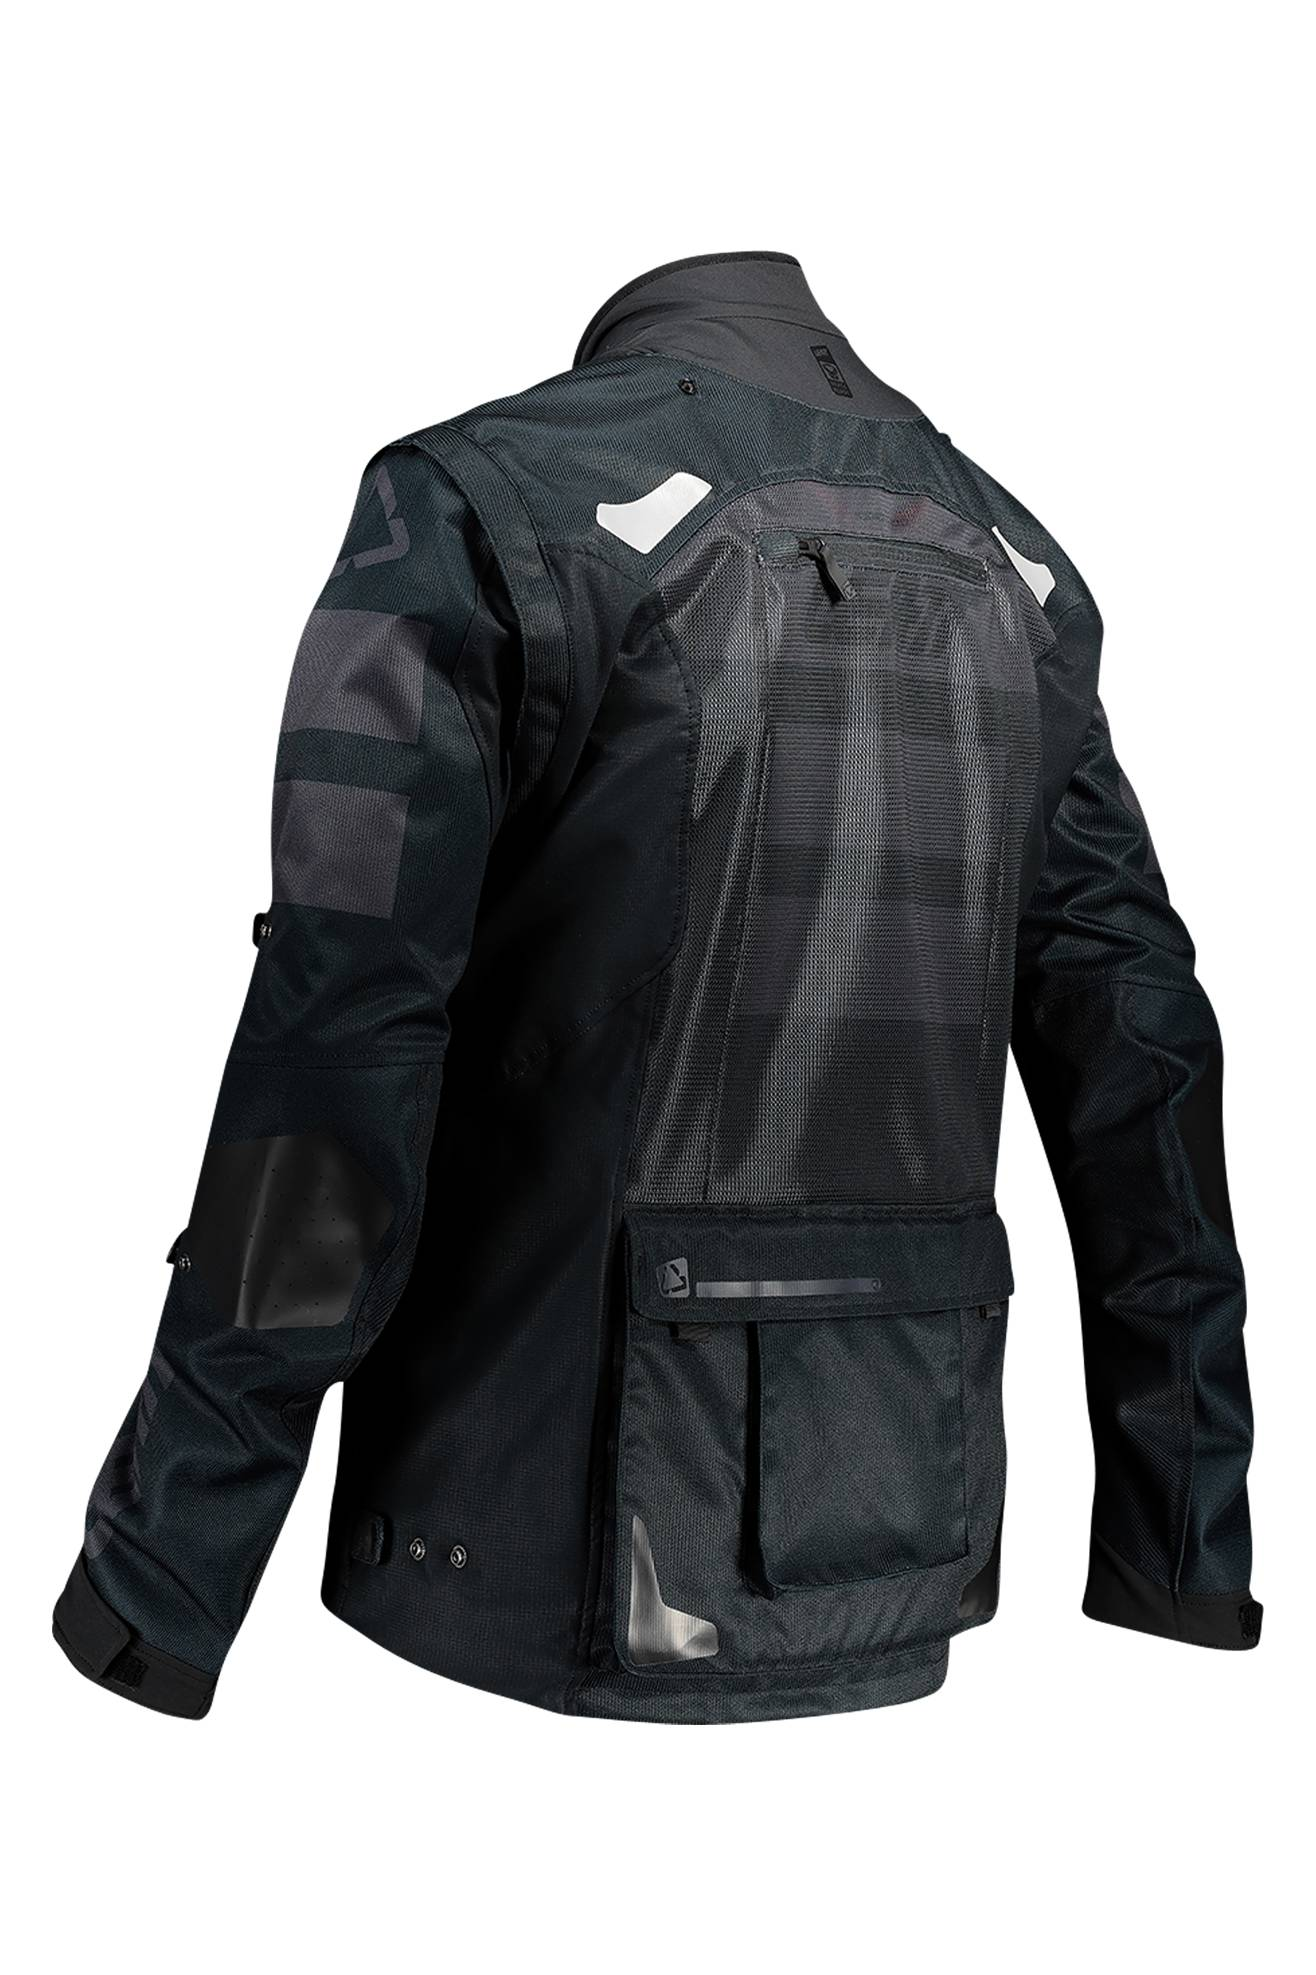 leatt giacca enduro  moto 4.5 x-flow nera